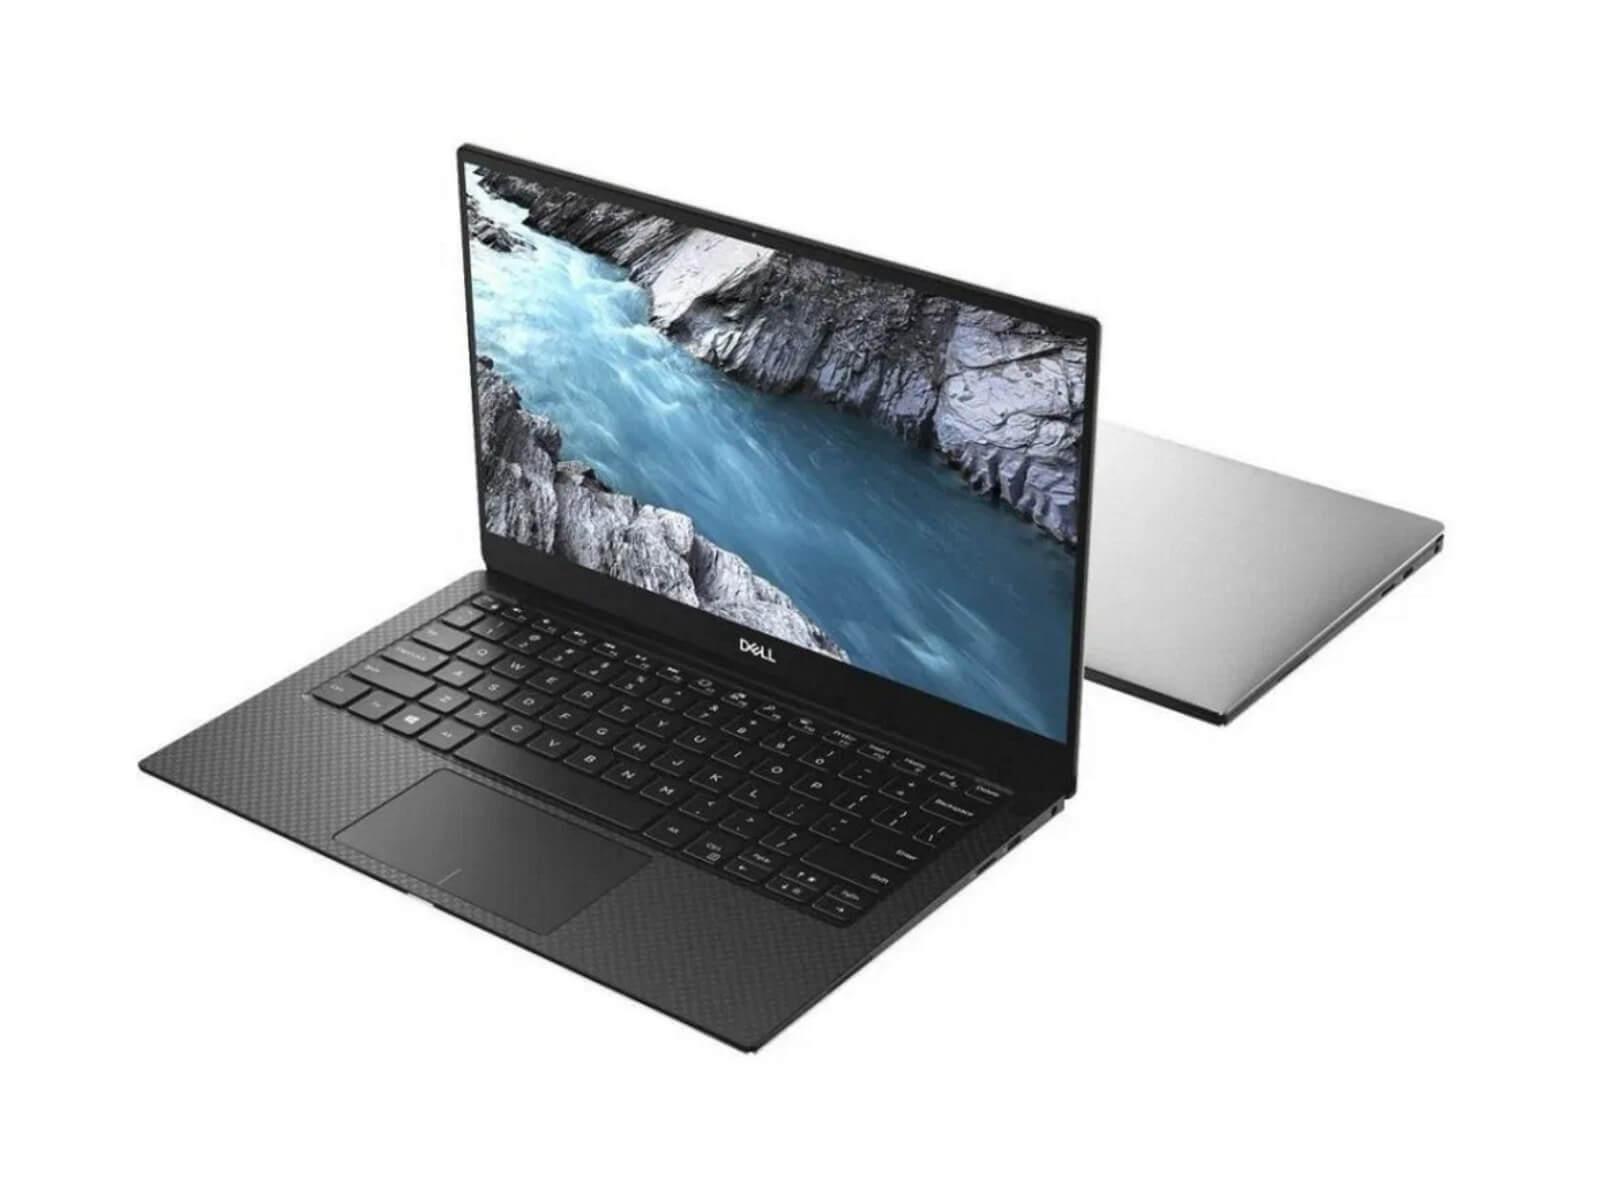 Dell XPS 7390 13, i5, 8GB RAM, 256SSD